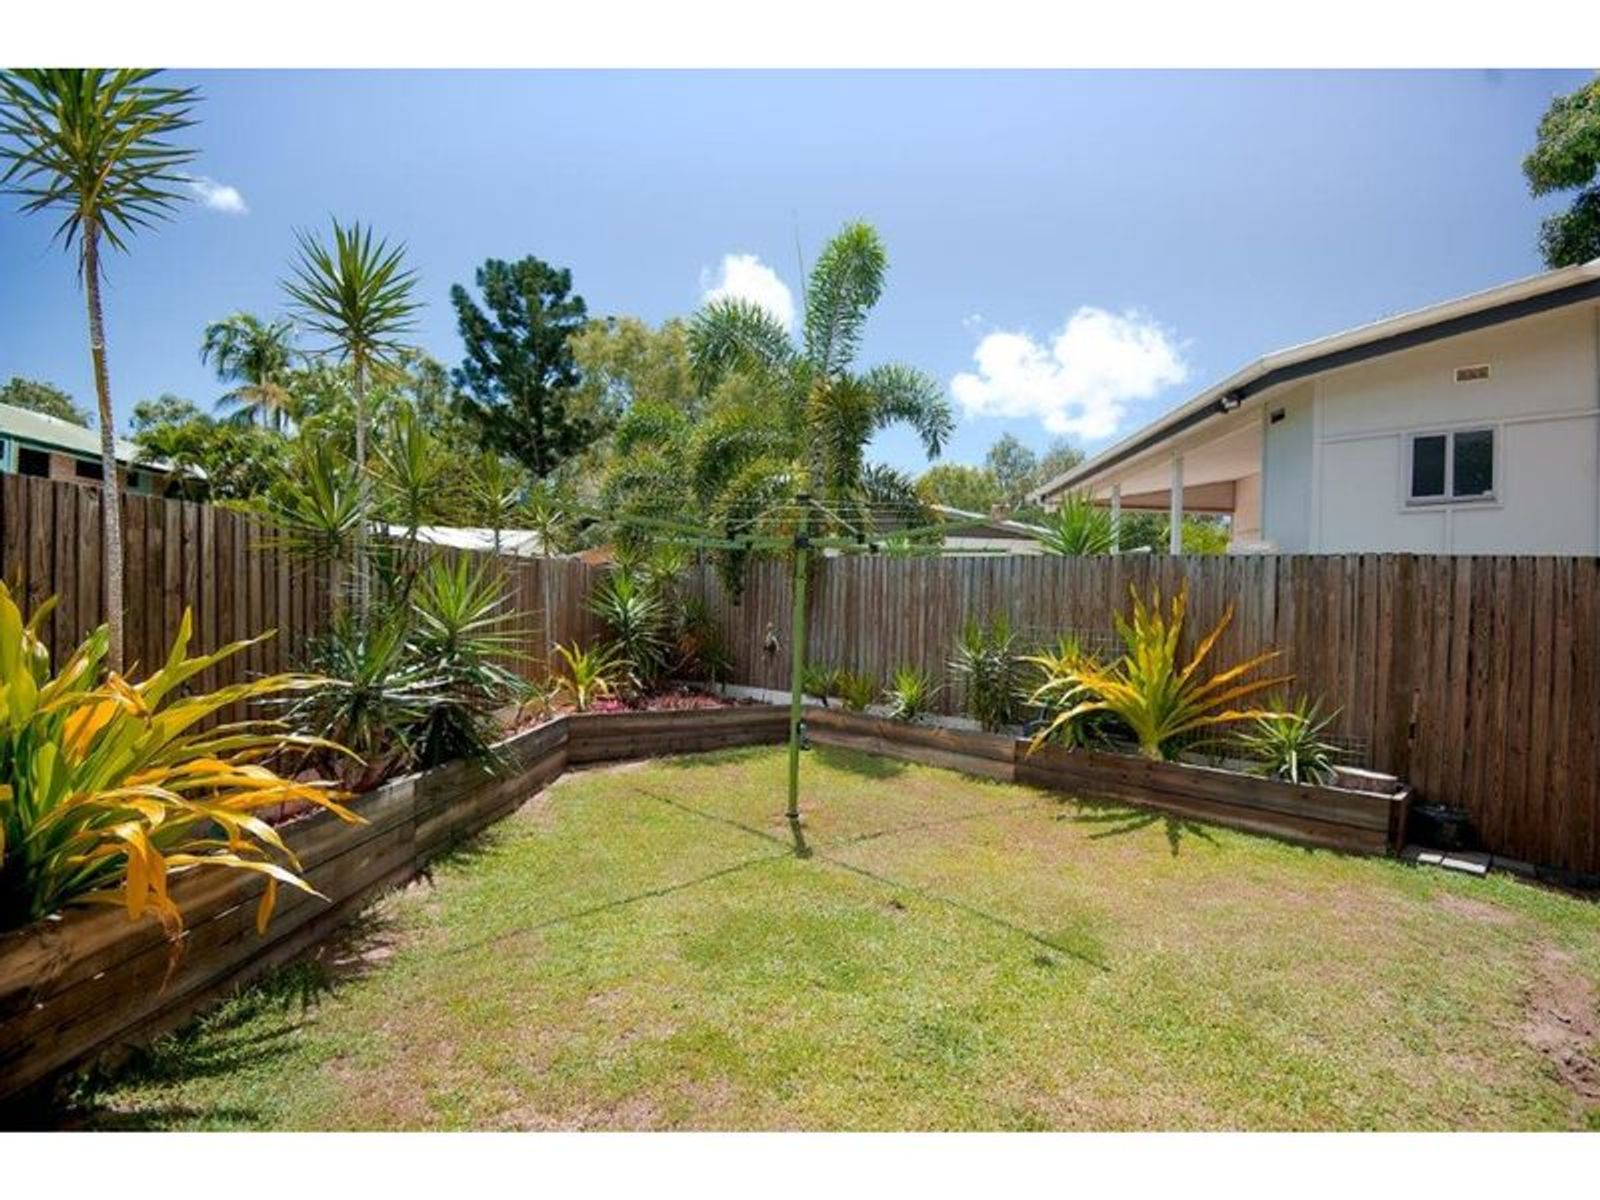 4/58 Waverley Street, Bucasia, QLD 4750